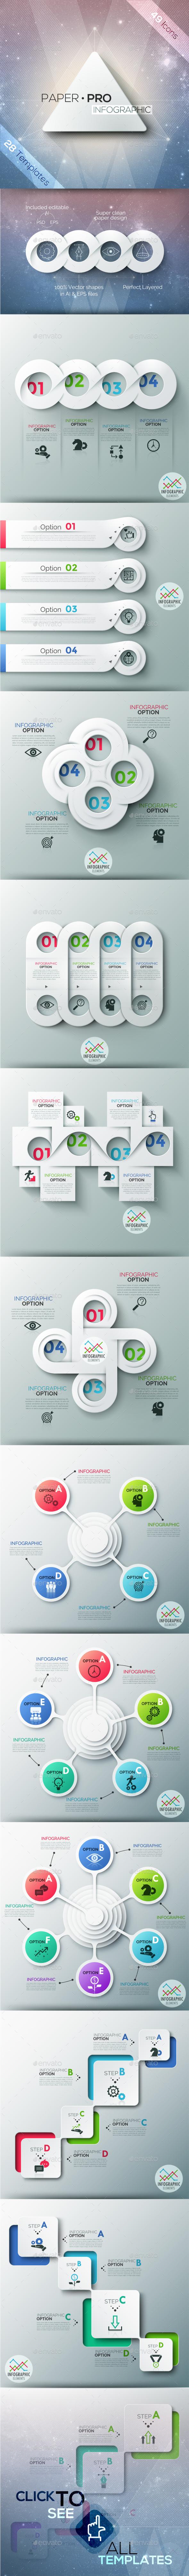 Paper-Pro Infographic - Infographics